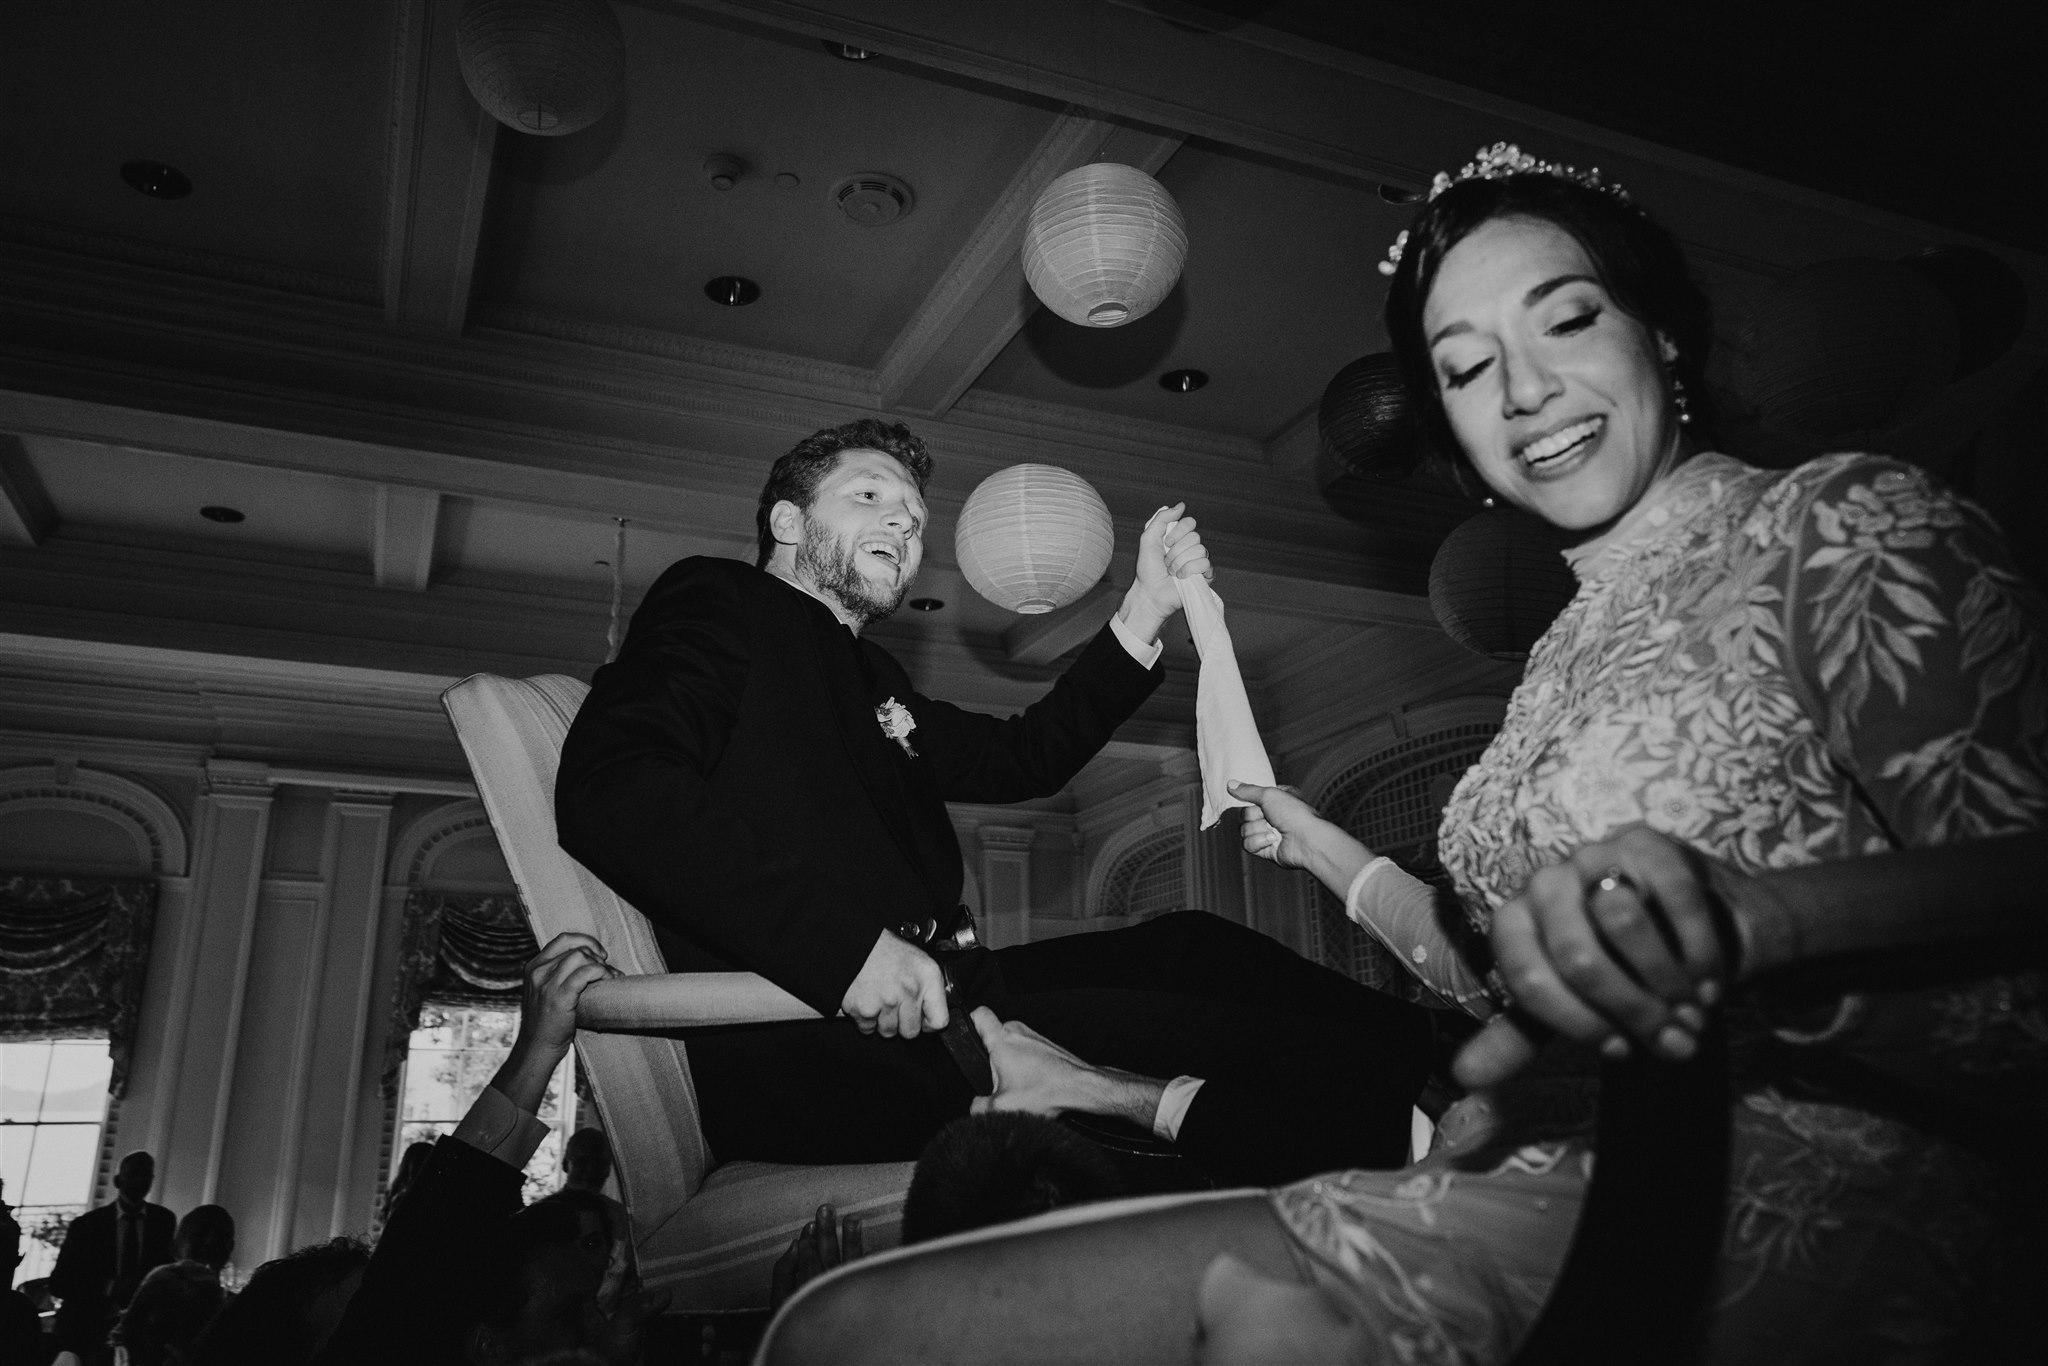 Chellise_Michael_Photography_Hudson_Valley_Wedding_Photographer_Otesaga_Hotel-6035.jpg